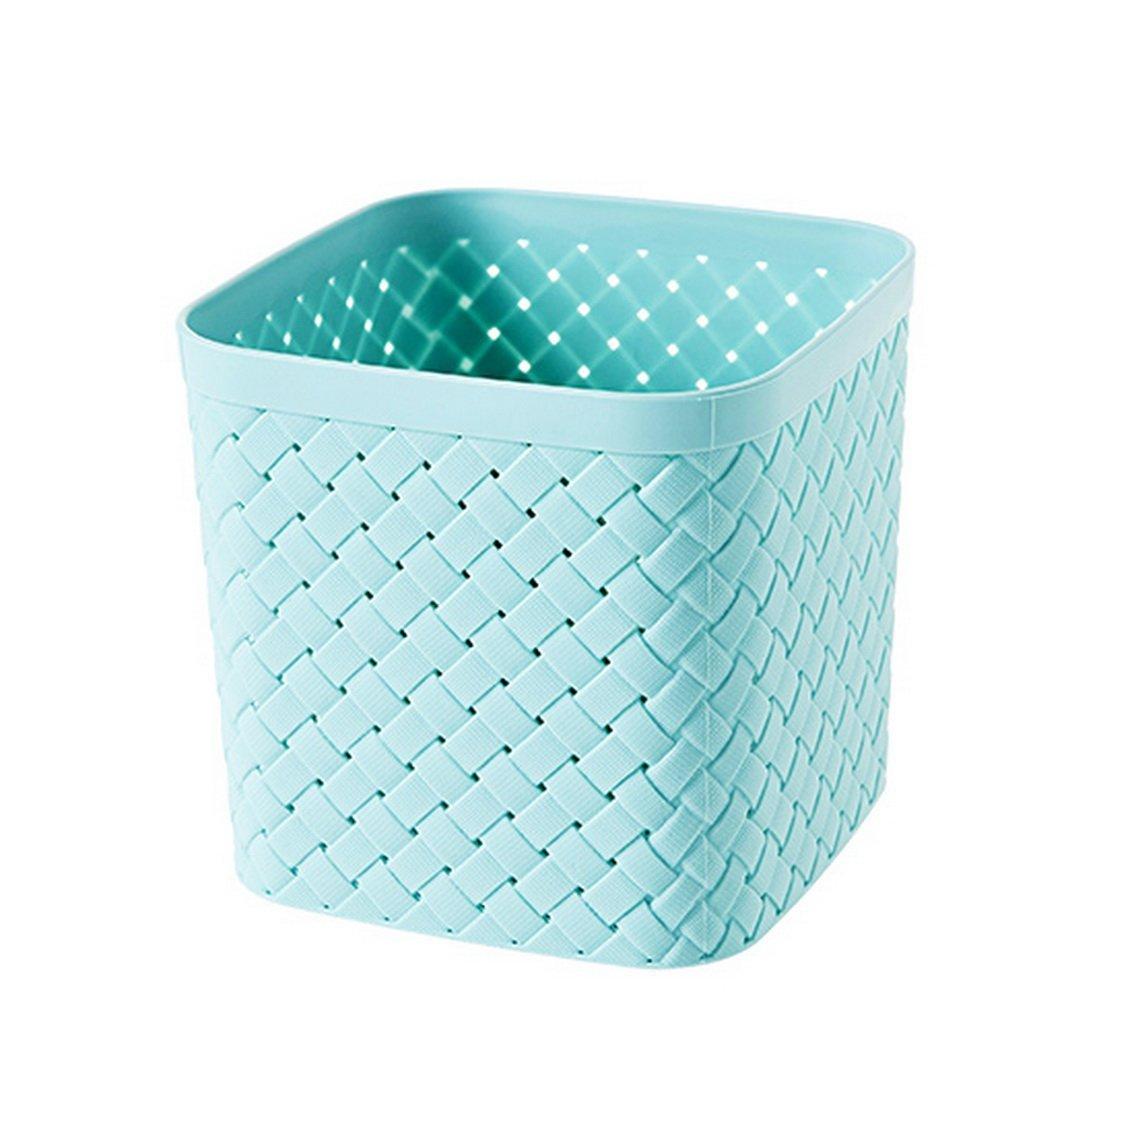 fengg2030shann Artificial weaving square storage baskets desktop storage hollow plastic debris basket baskets child storage box storage basket. Storage basket storage basket storage basket storage bas